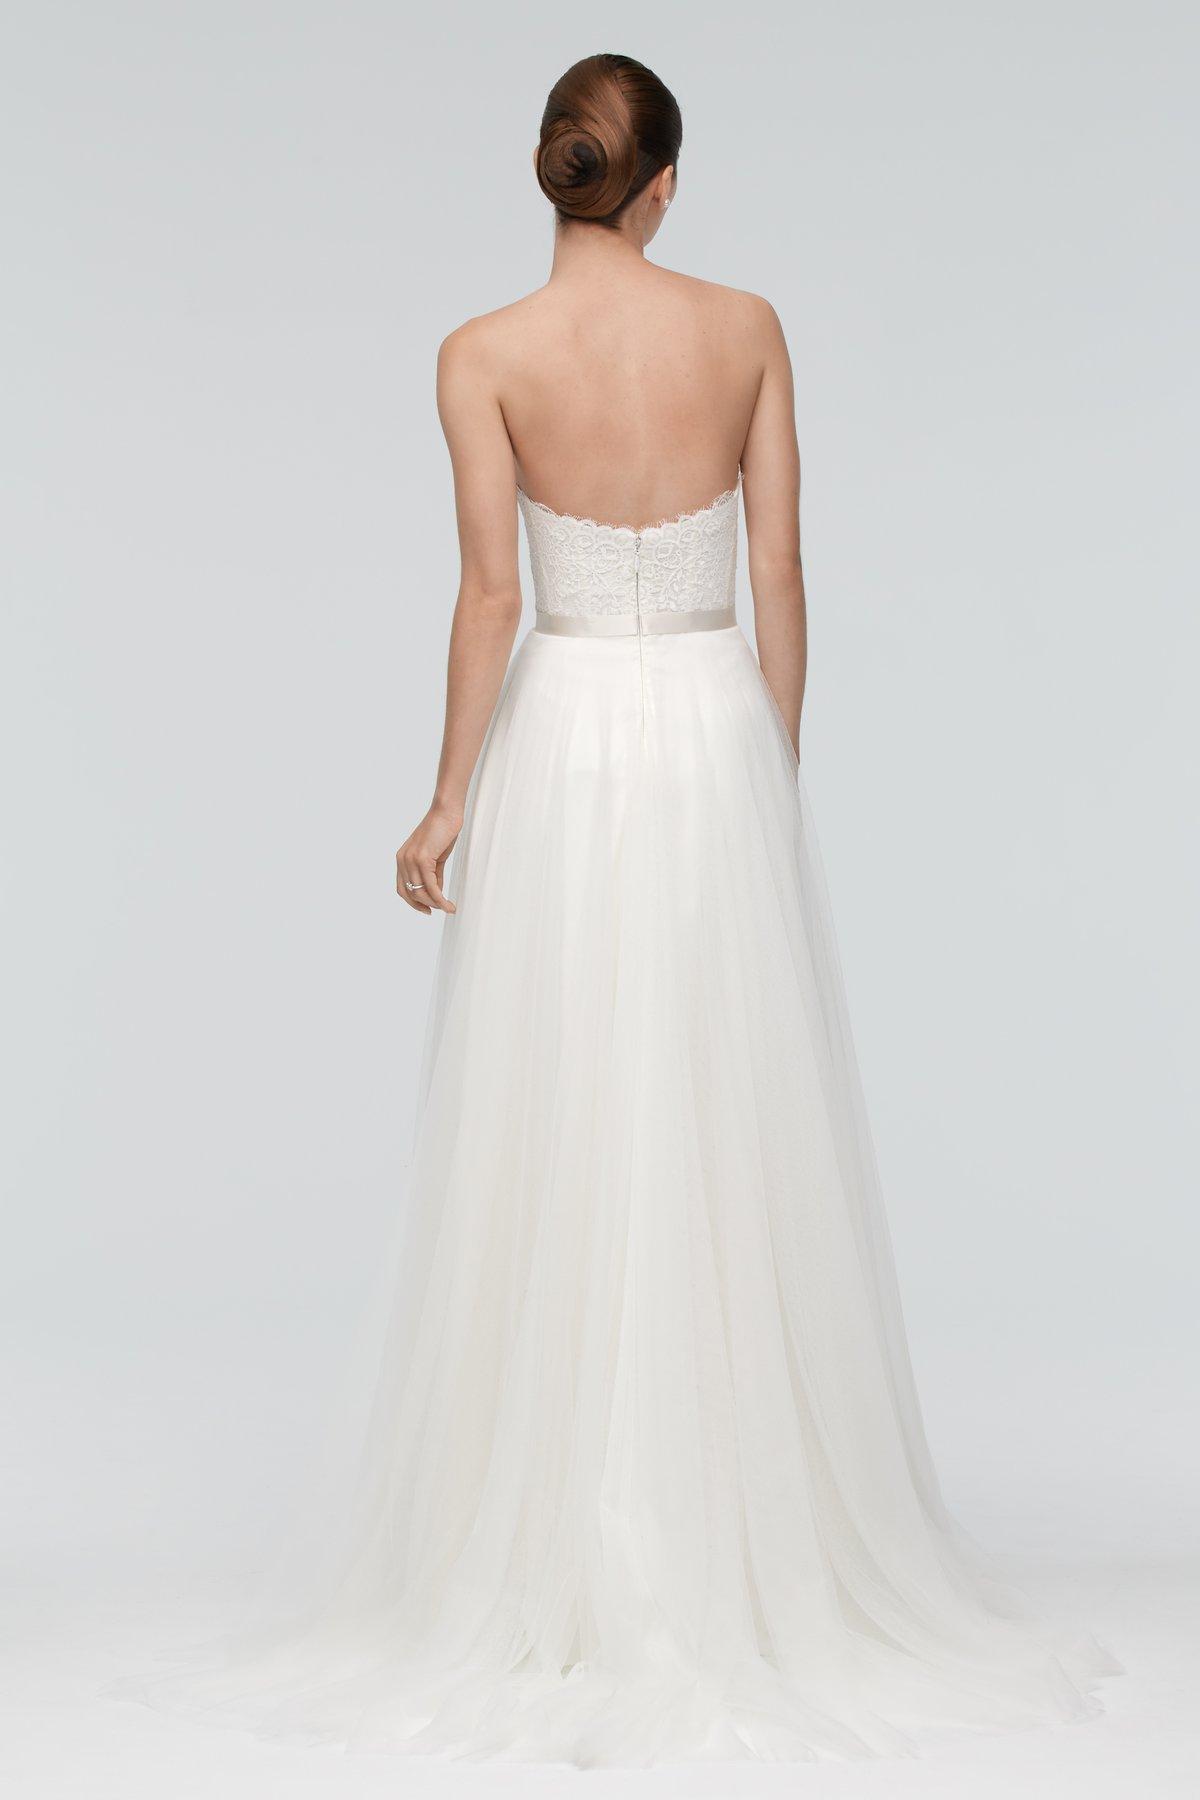 Karington 9080B | Watters Brides | Watters